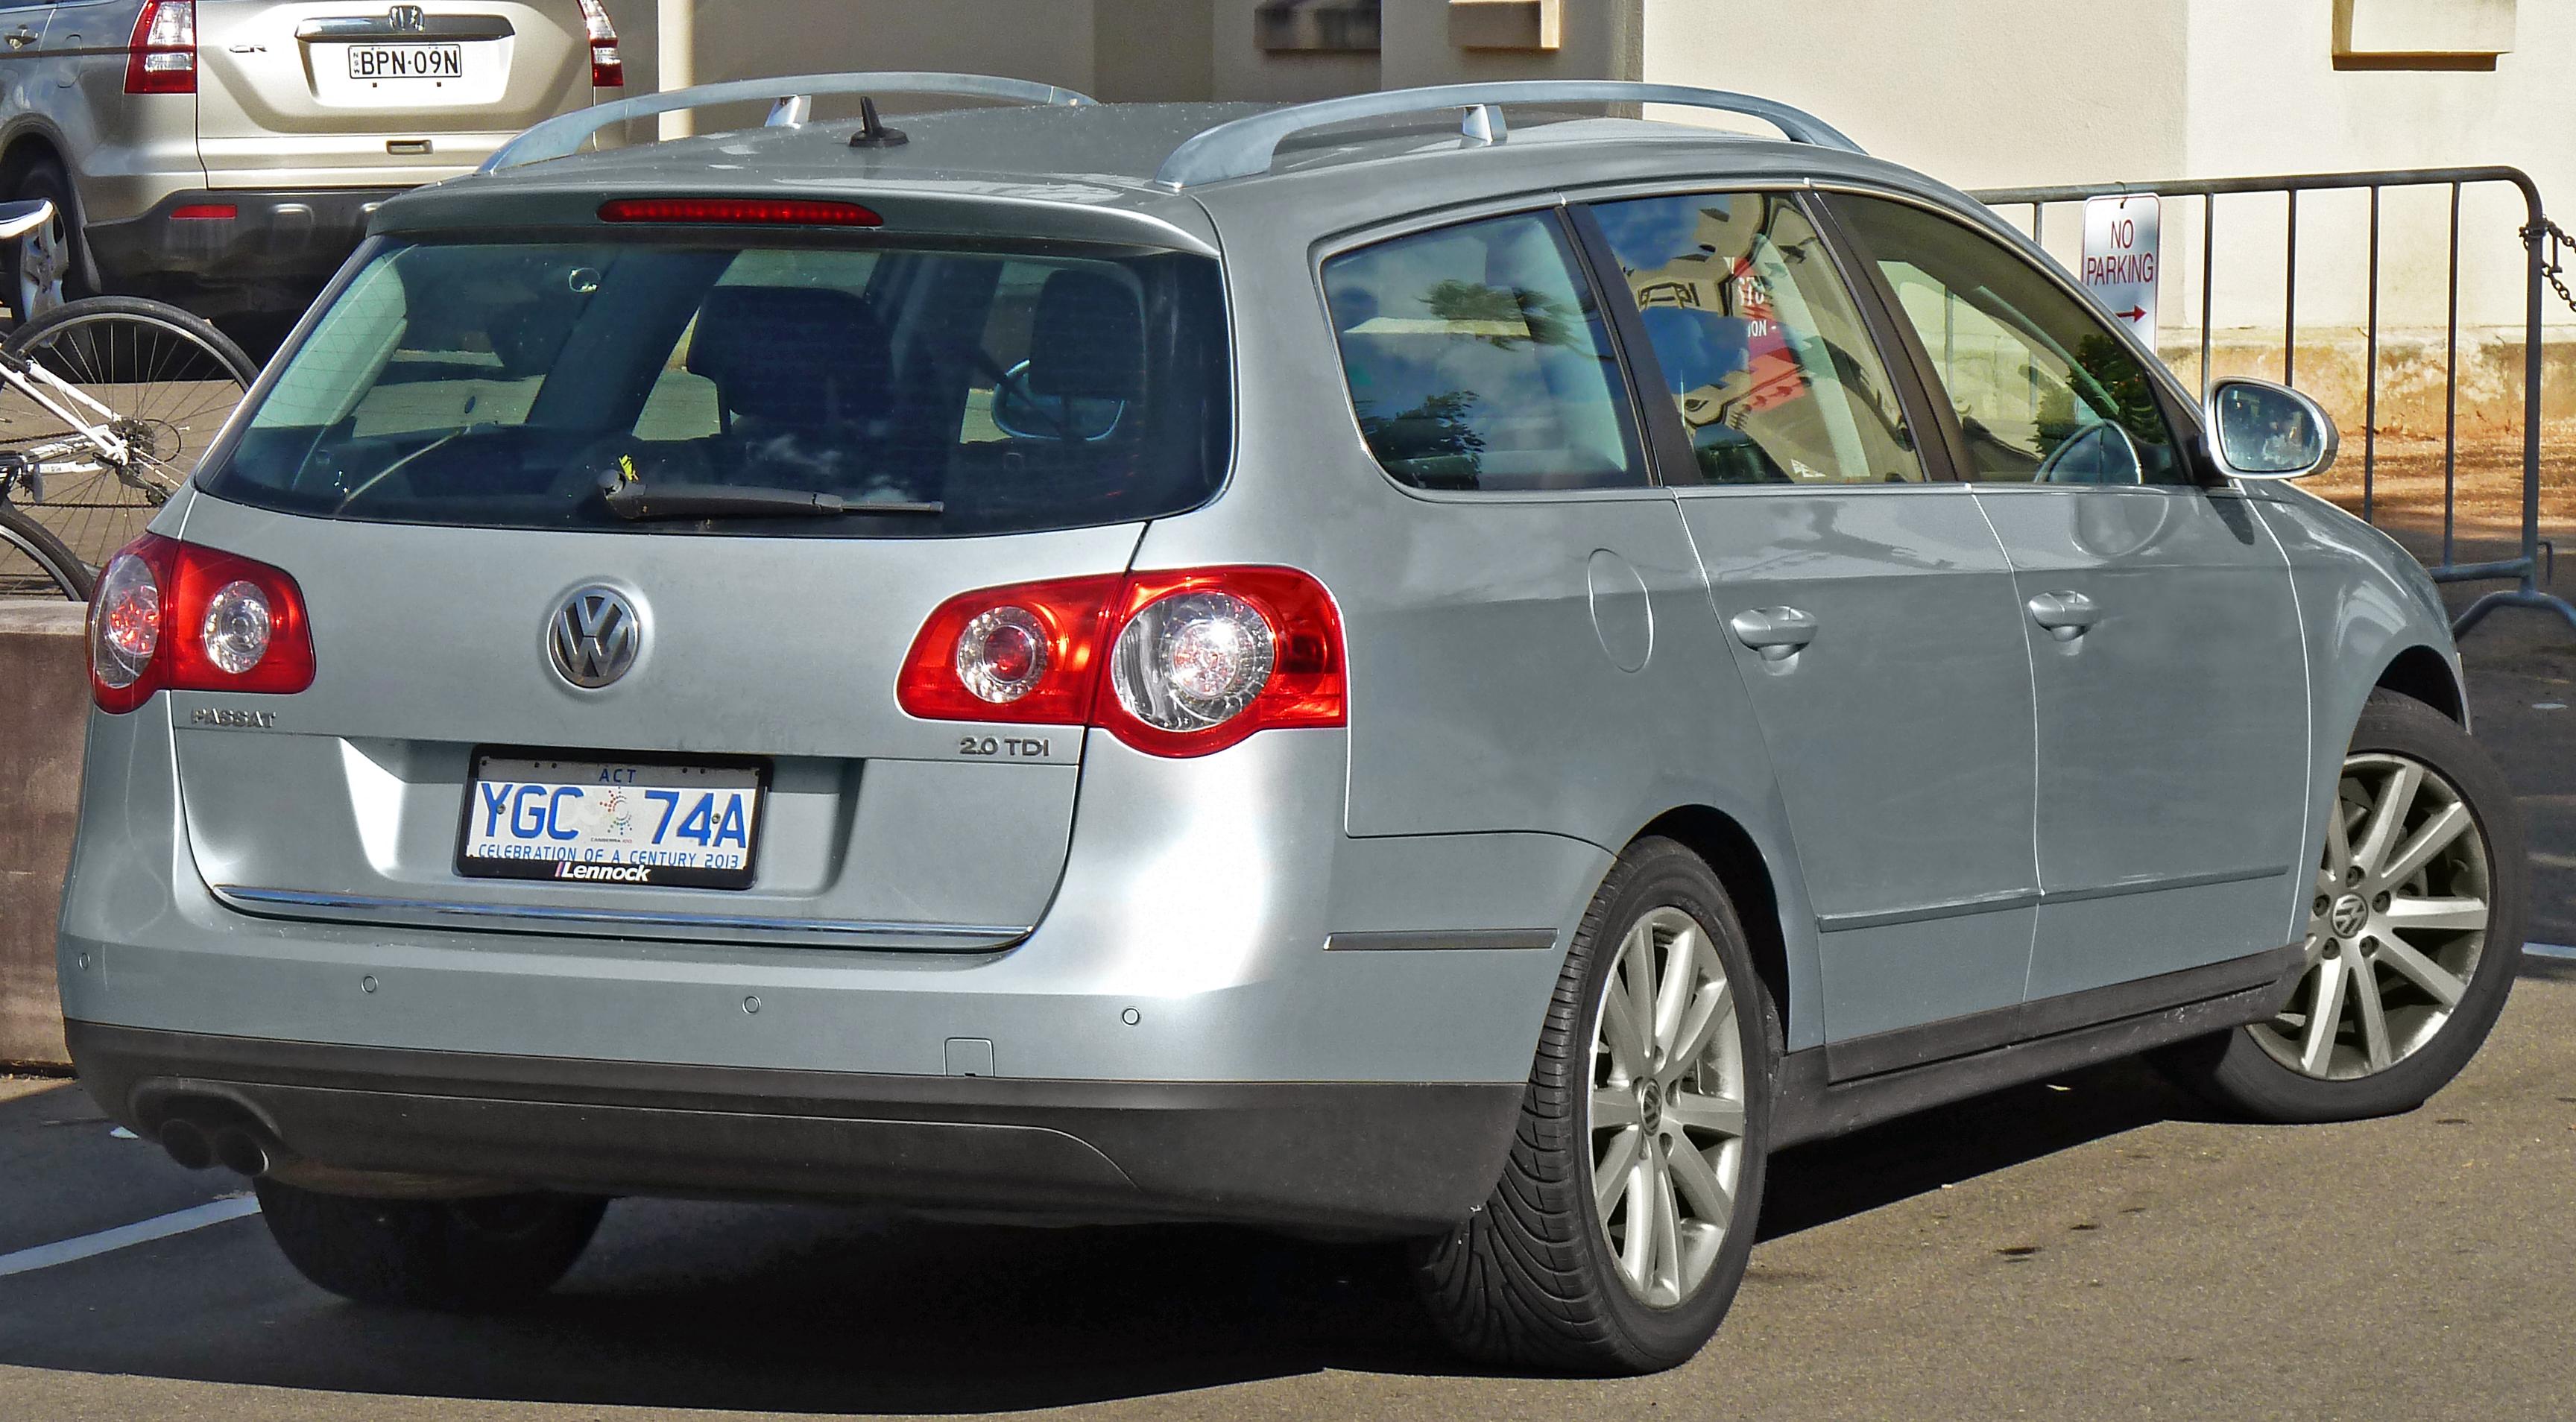 File:2006-2010 Volkswagen Passat (3C) 2.0 TDI station ...